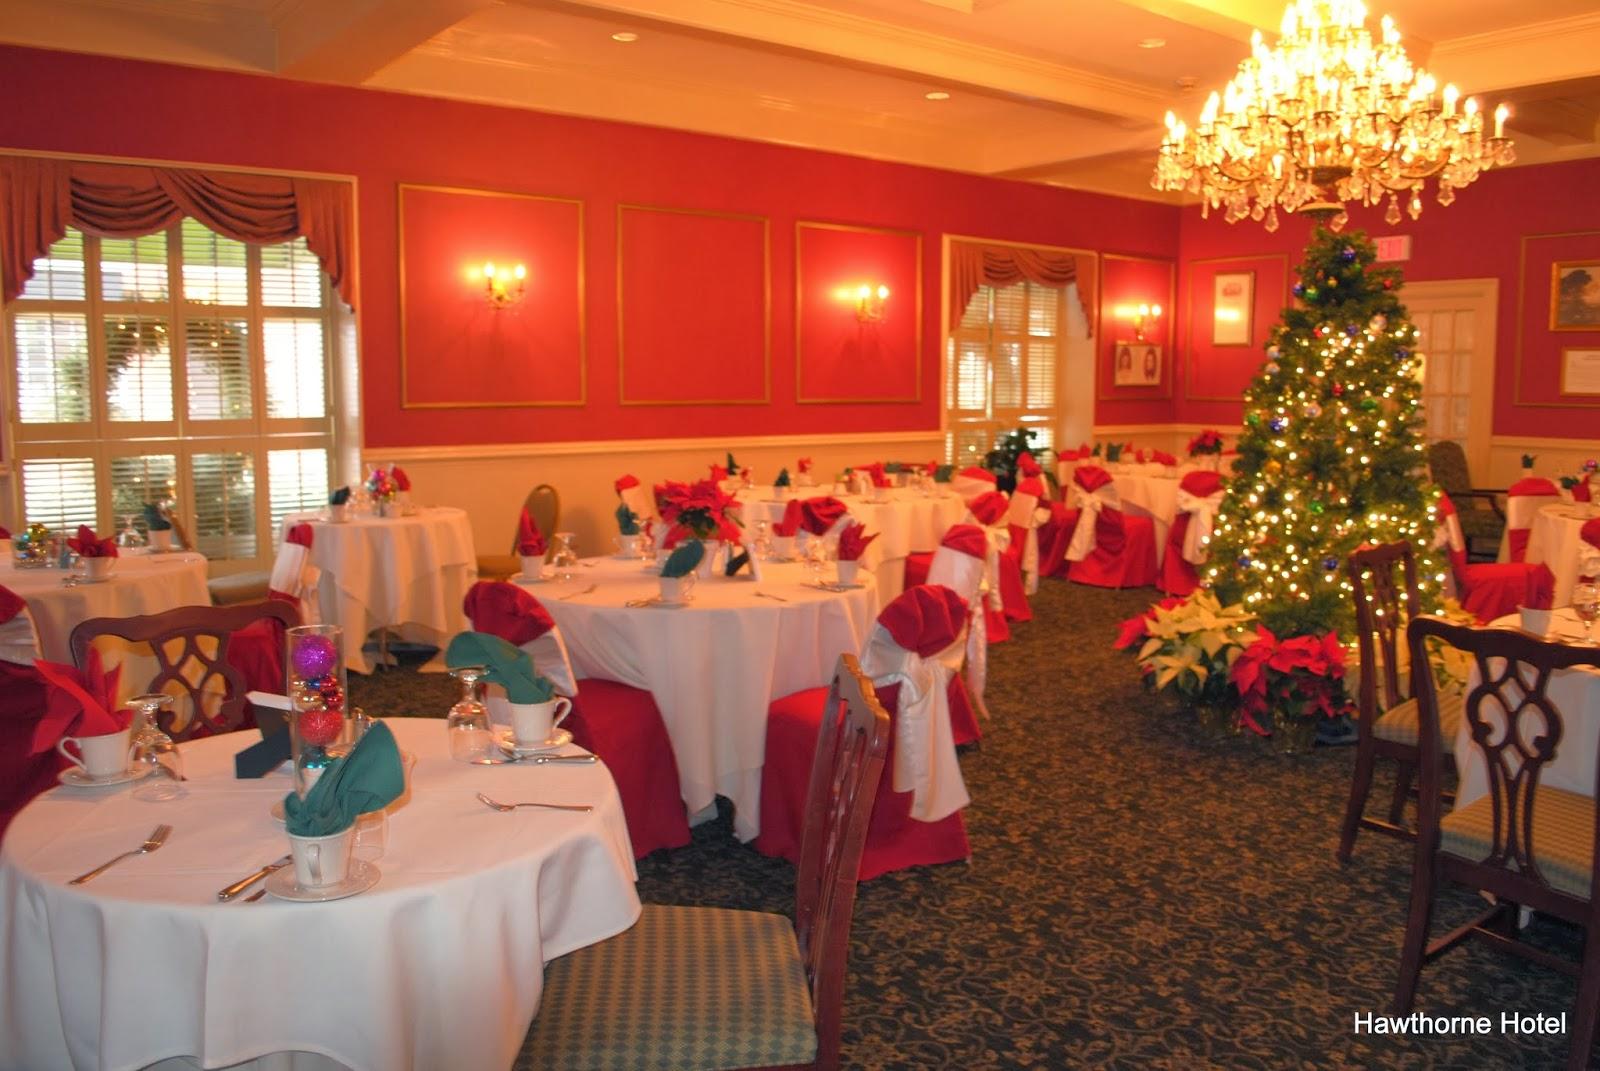 Hawthorne Hotel: Christmas Day Grand Buffet Menu